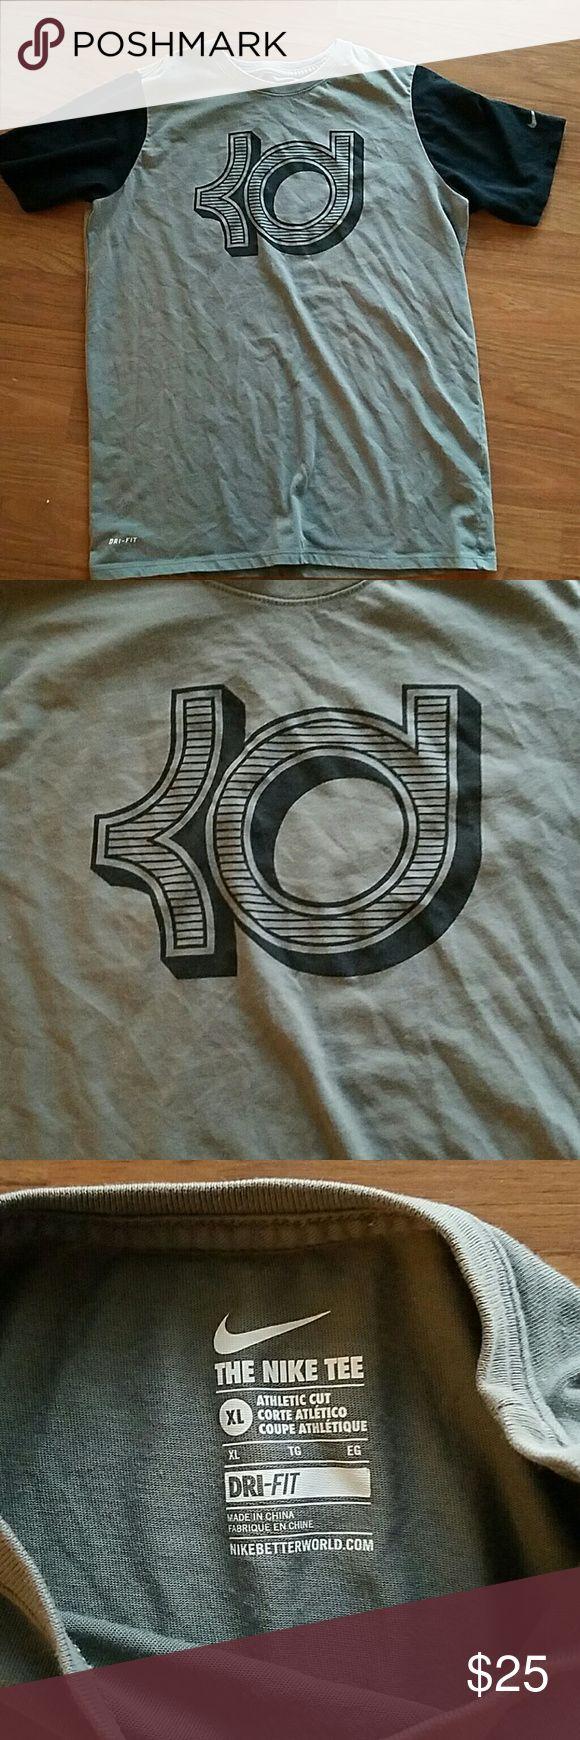 Kevin Durant Nike xl tshirt kids Kids xl kd Nike tshirt. Very good condition. Colours are grey and black Nike Shirts & Tops Tees - Short Sleeve